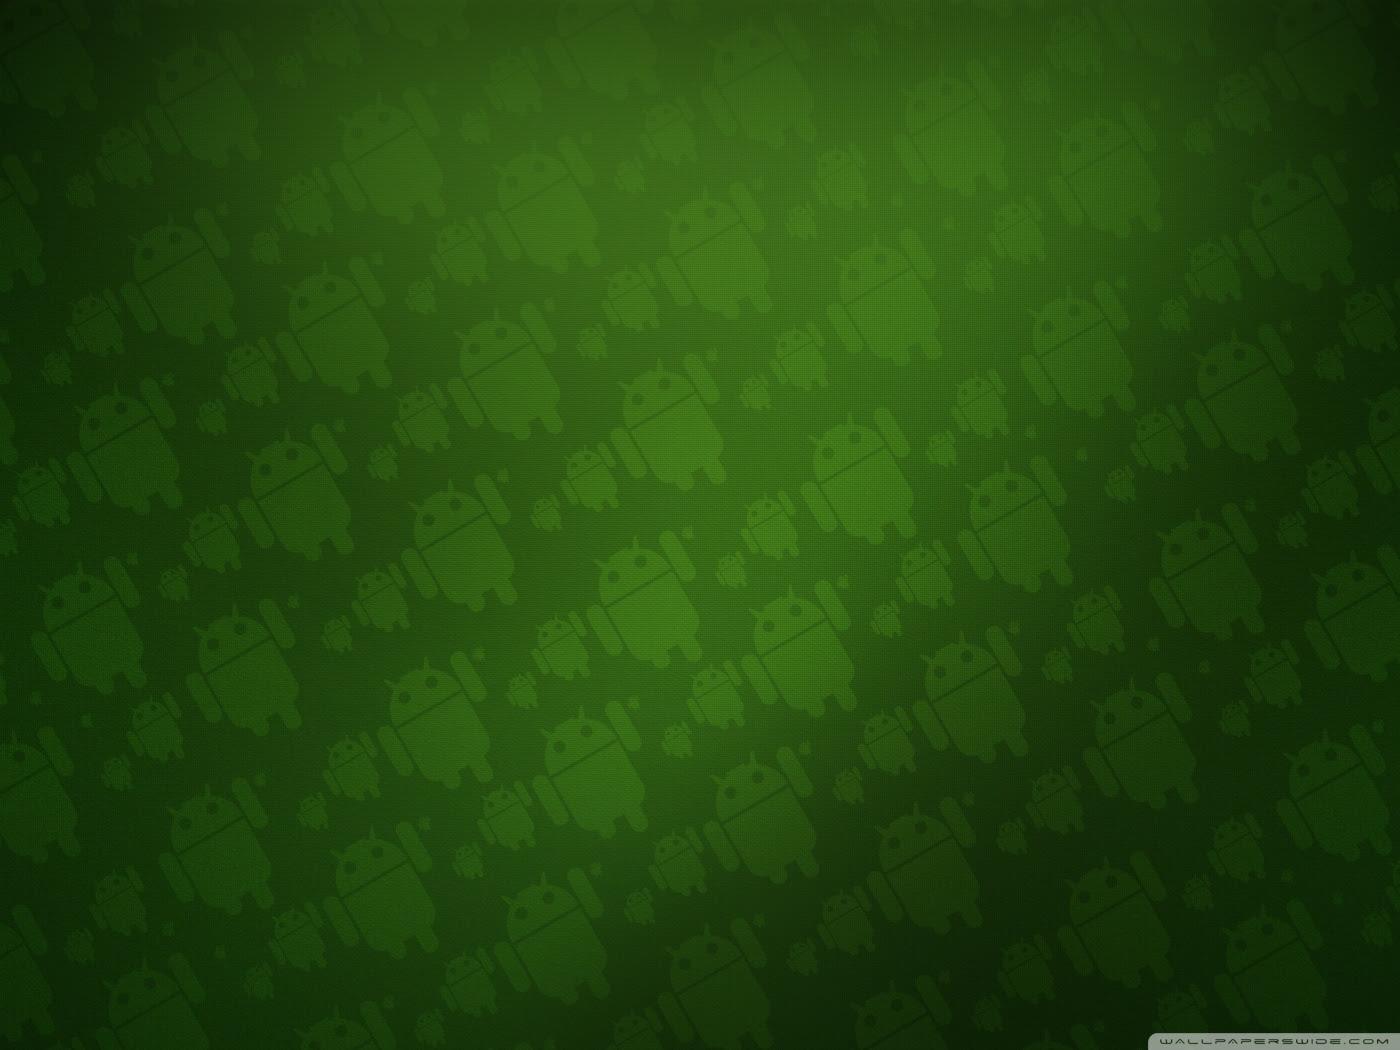 Android Green Background HD Desktop Wallpaper High Definition